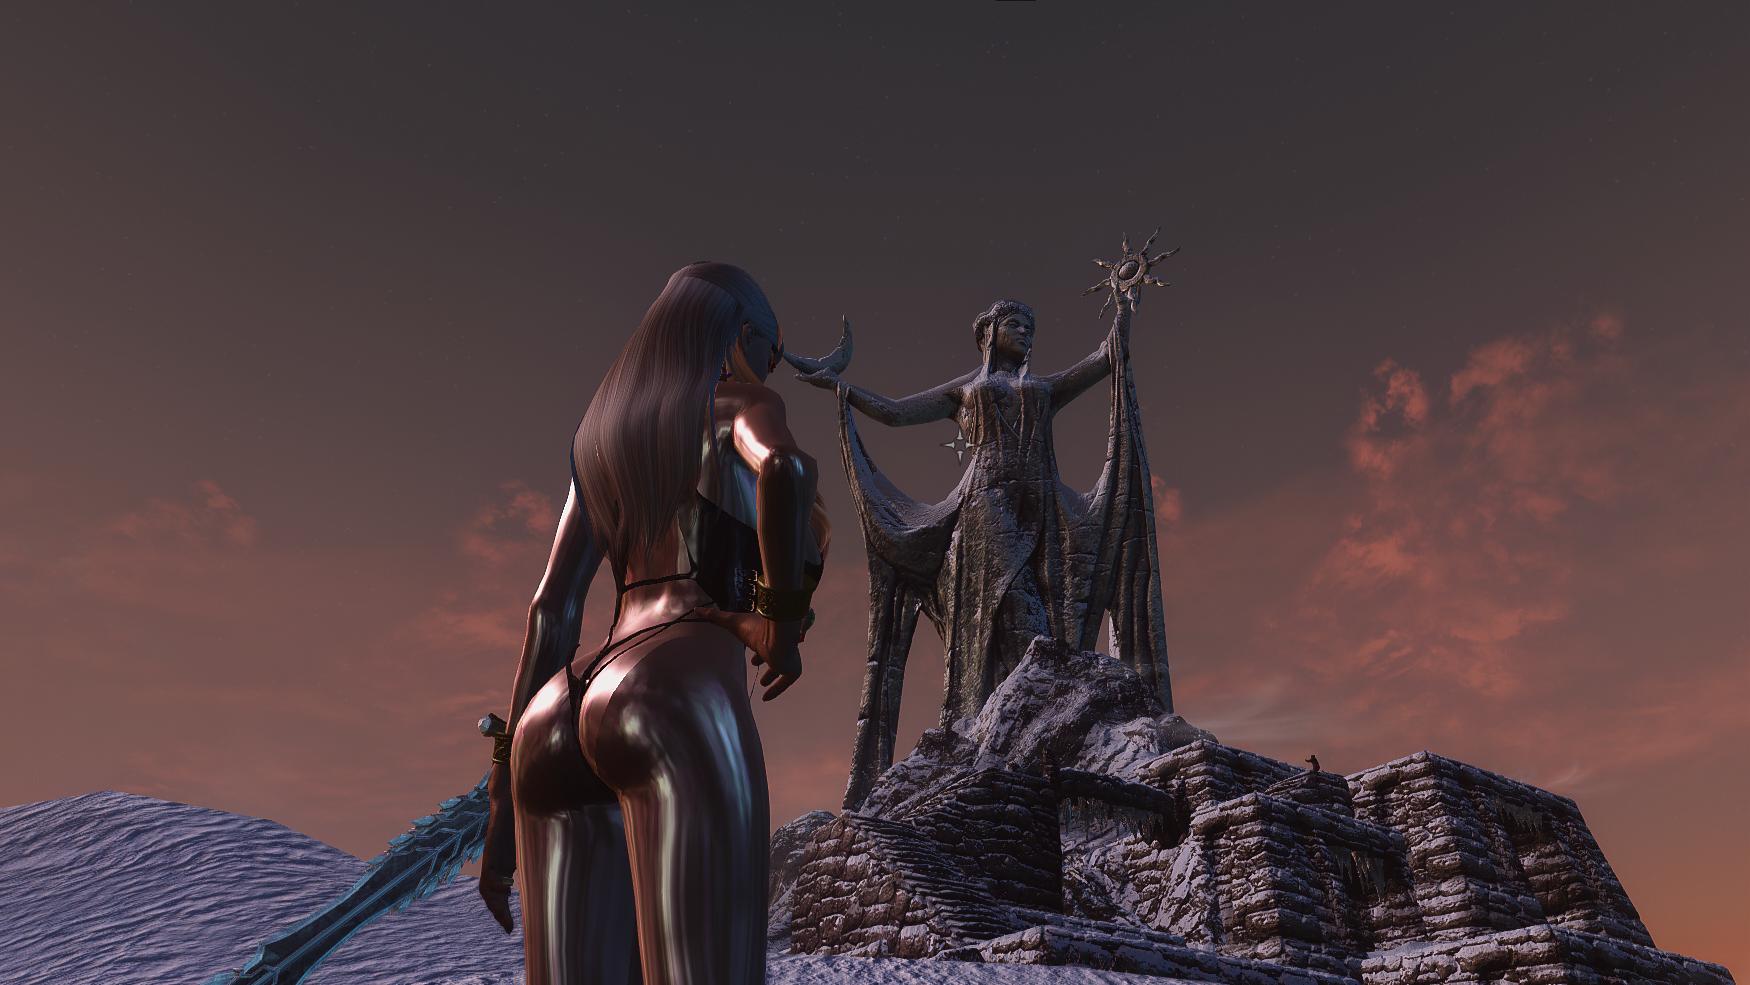 Tes V - Skyrim Screenshot 2018.06.18 - 05.56.47.32.png - Elder Scrolls 5: Skyrim, the